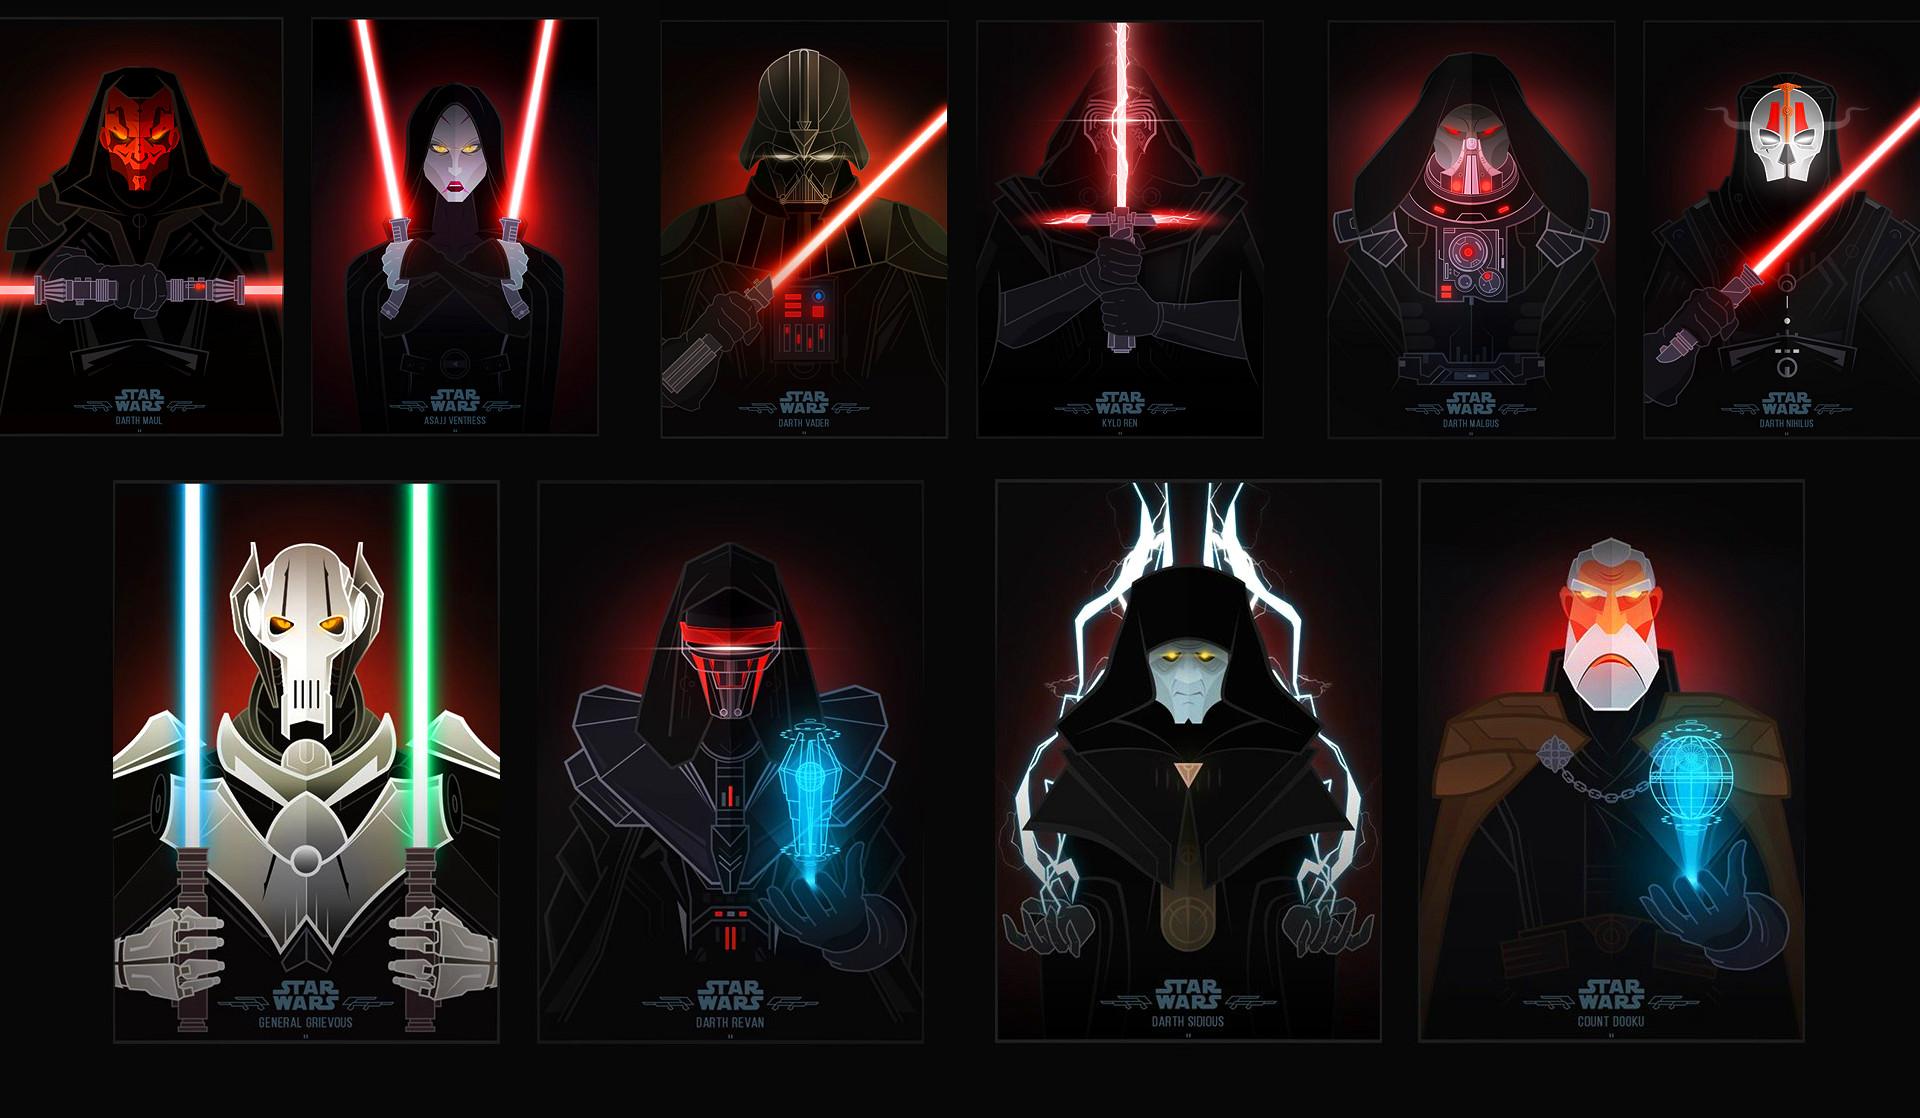 Star Wars Hd Wallpaper Background Image 1920x1118 Id 901261 Wallpaper Abyss